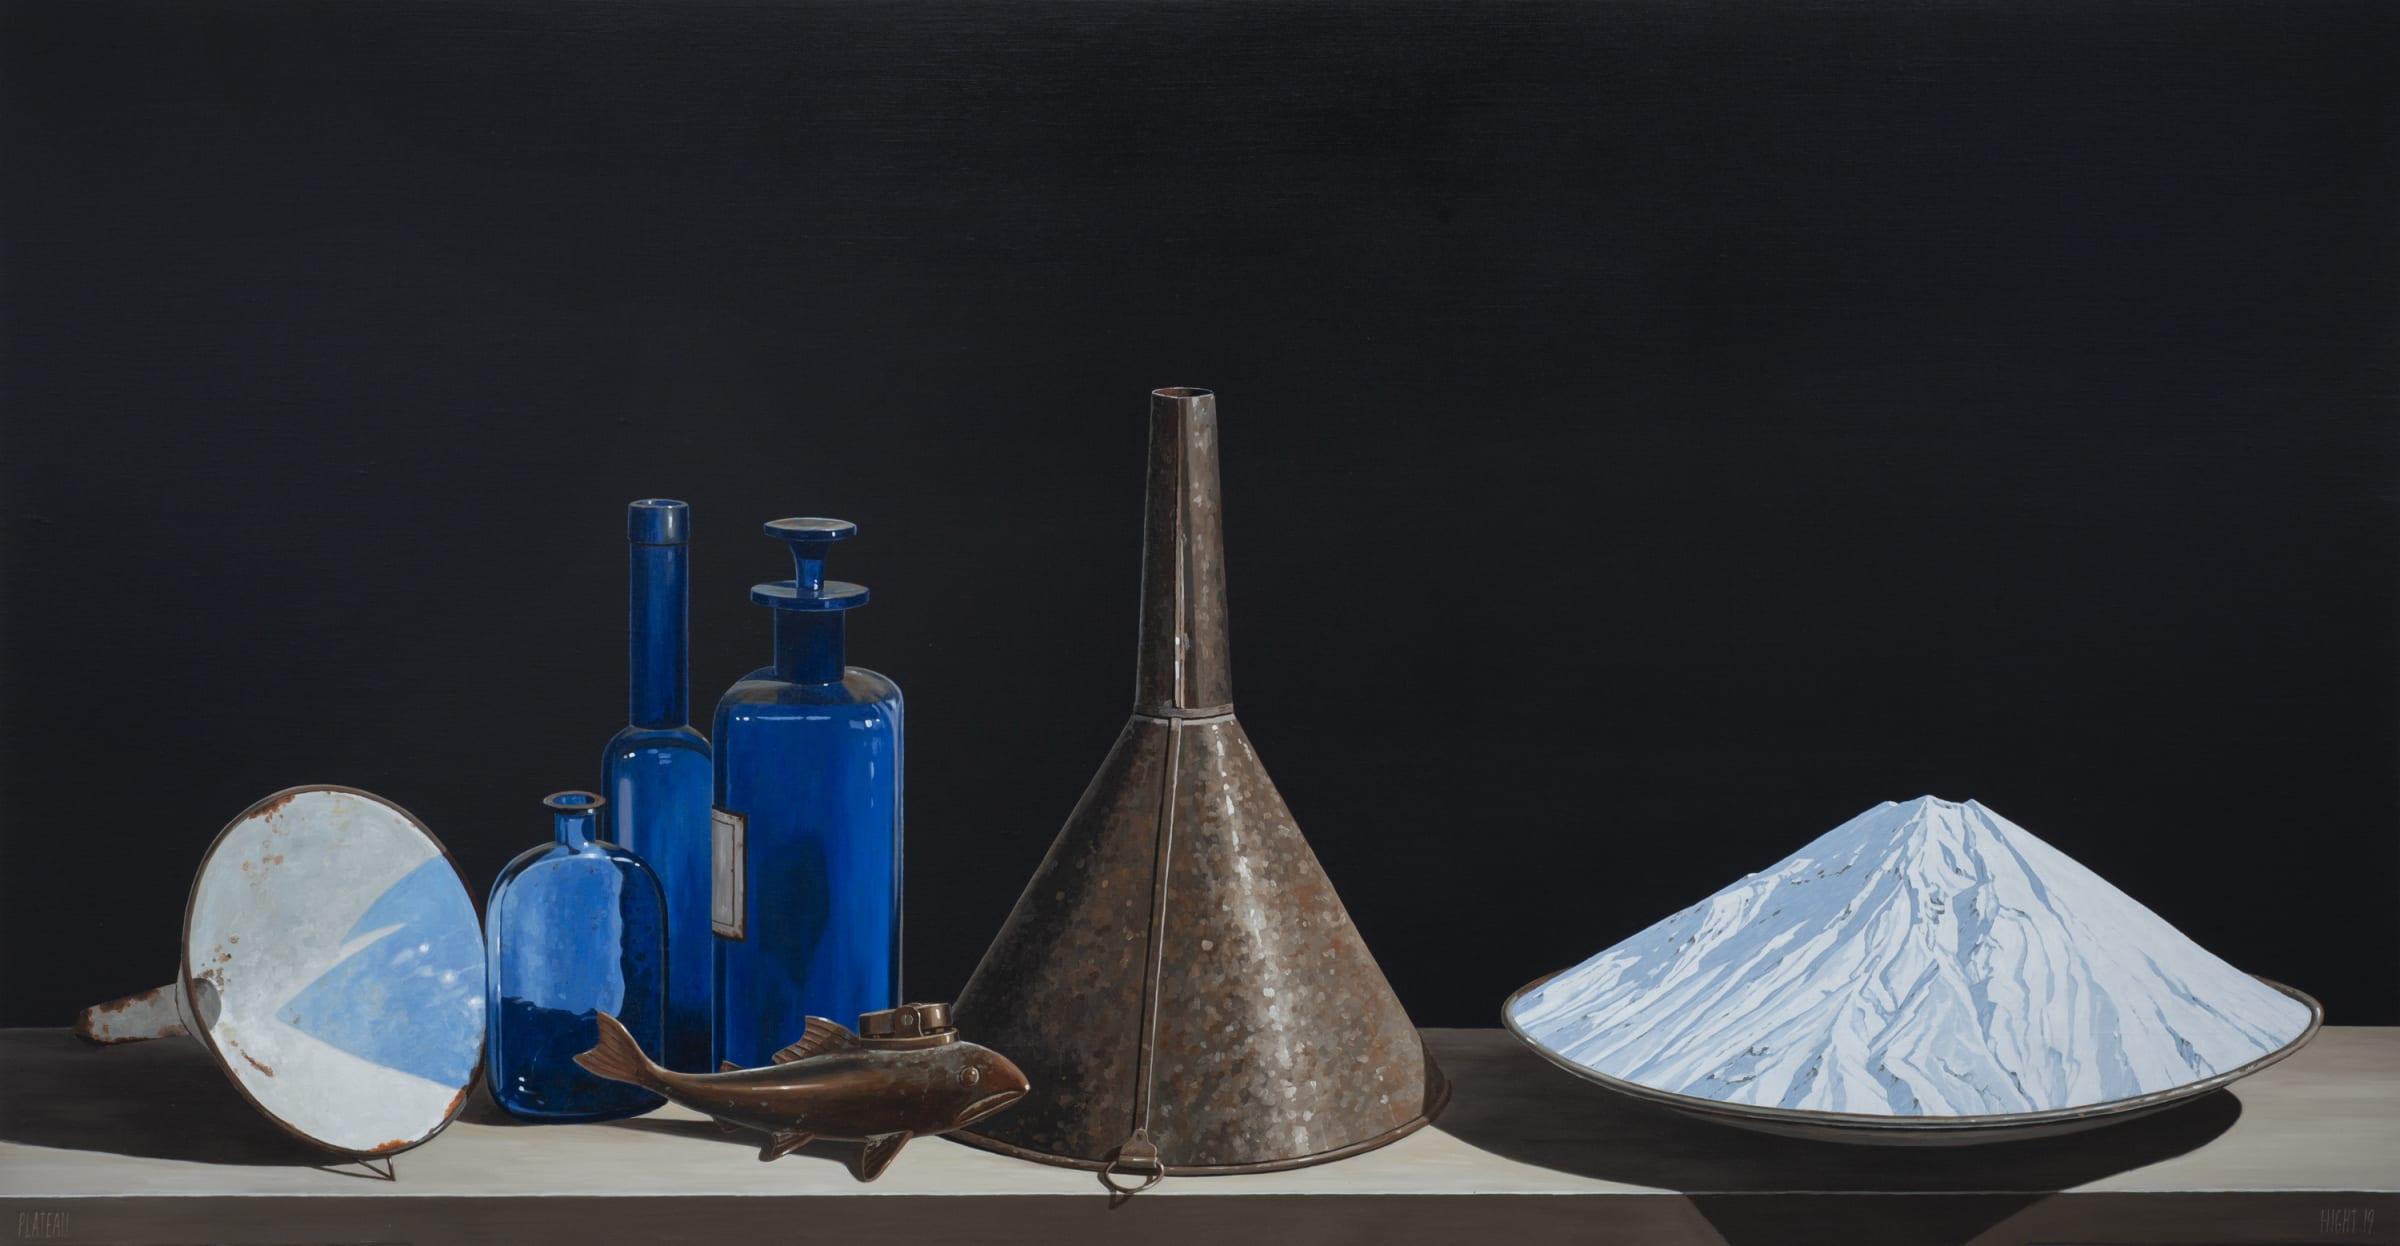 "<span class=""link fancybox-details-link""><a href=""/artists/55-michael-hight/works/8300-michael-hight-plateau-2019/"">View Detail Page</a></span>Michael Hight   Plateau, 2019   oil on linen   710 mm x 1370 mm"